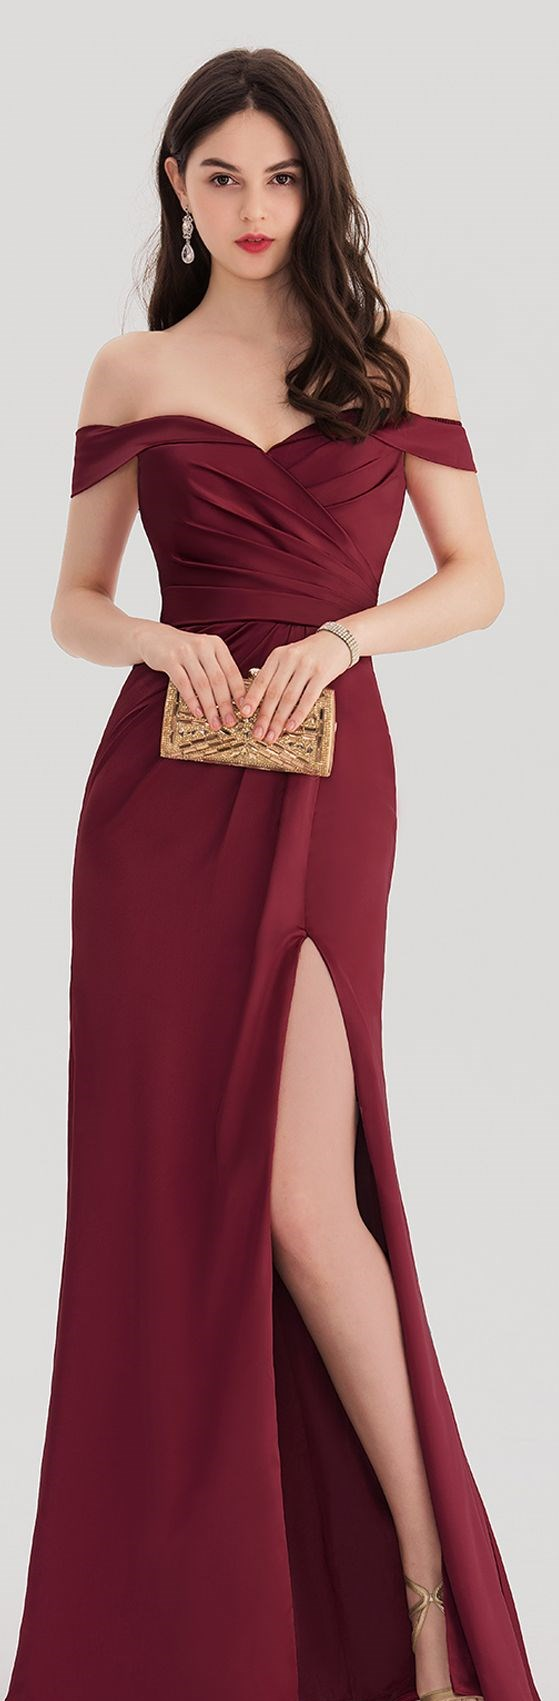 8b561953e510 Sheath/Column Off-the-Shoulder Floor-Length Satin Prom Dresses With Ruffle